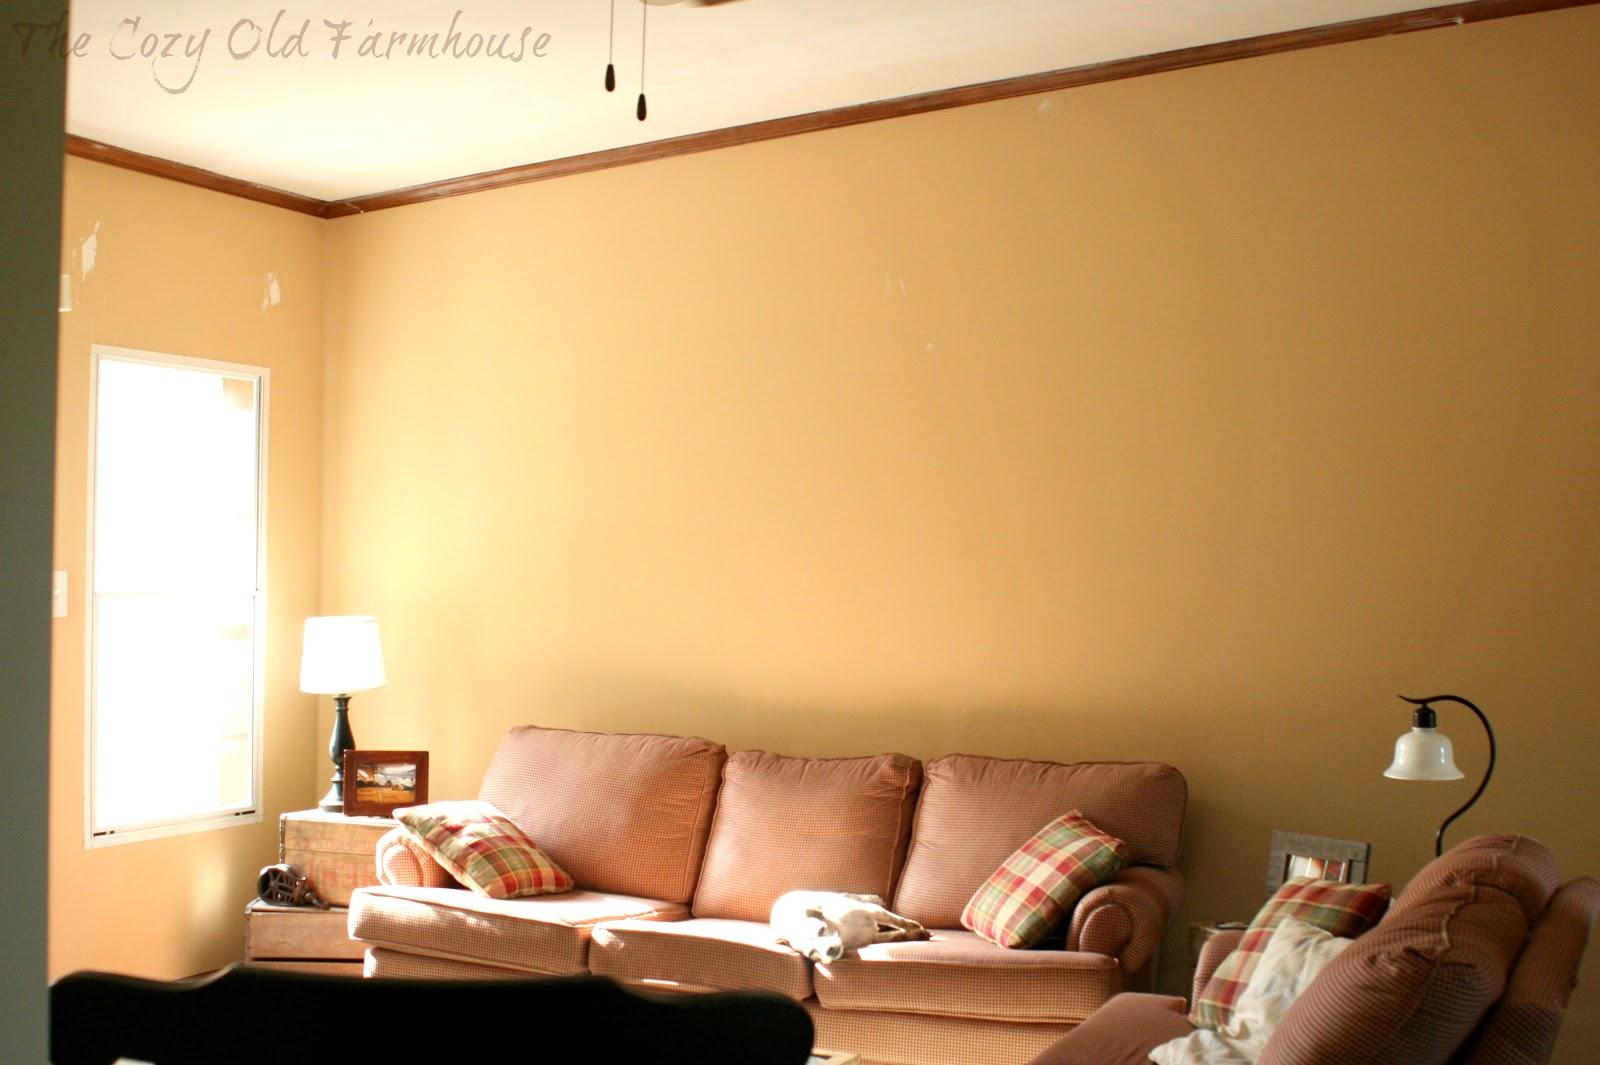 Enchanting Living Room Wall Color Shades Collection - Wall Art ...